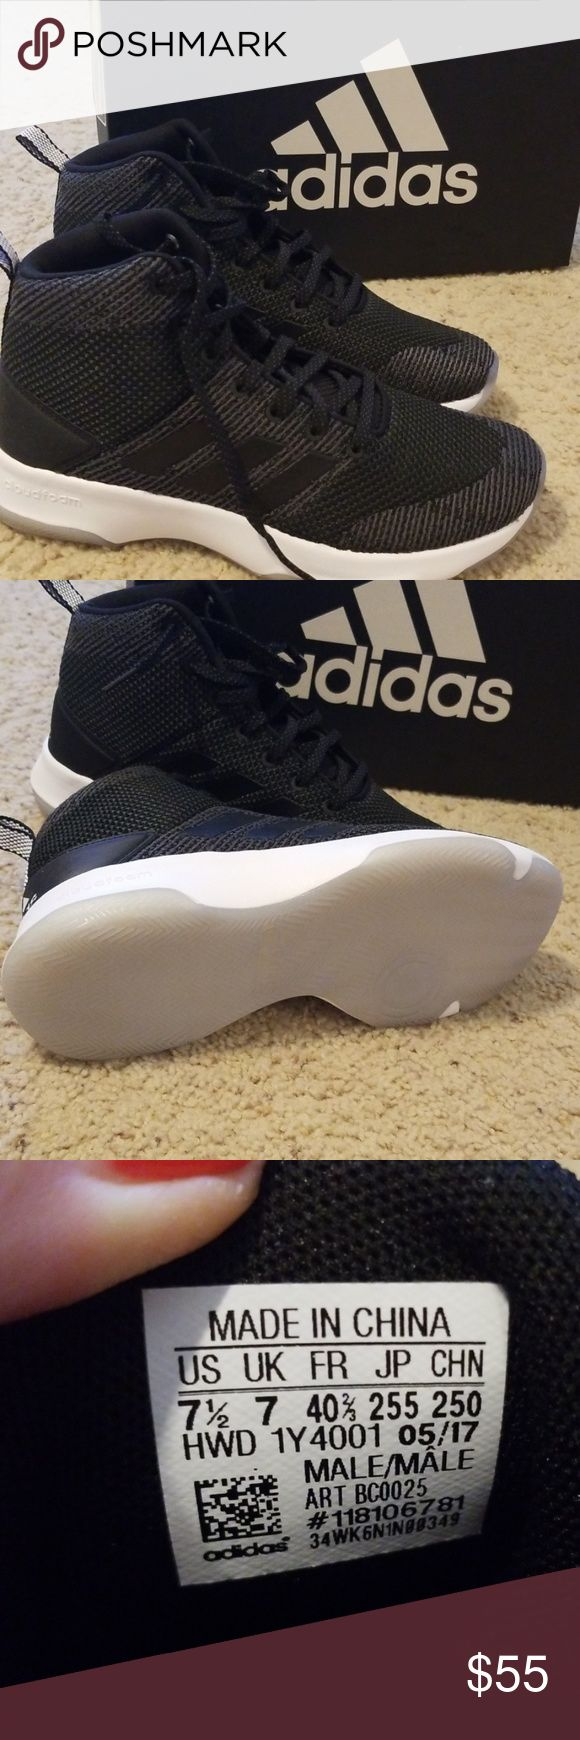 Nwt Adidas Mens Basketball Shoes Adidas Men Basketball Shoes Adidas